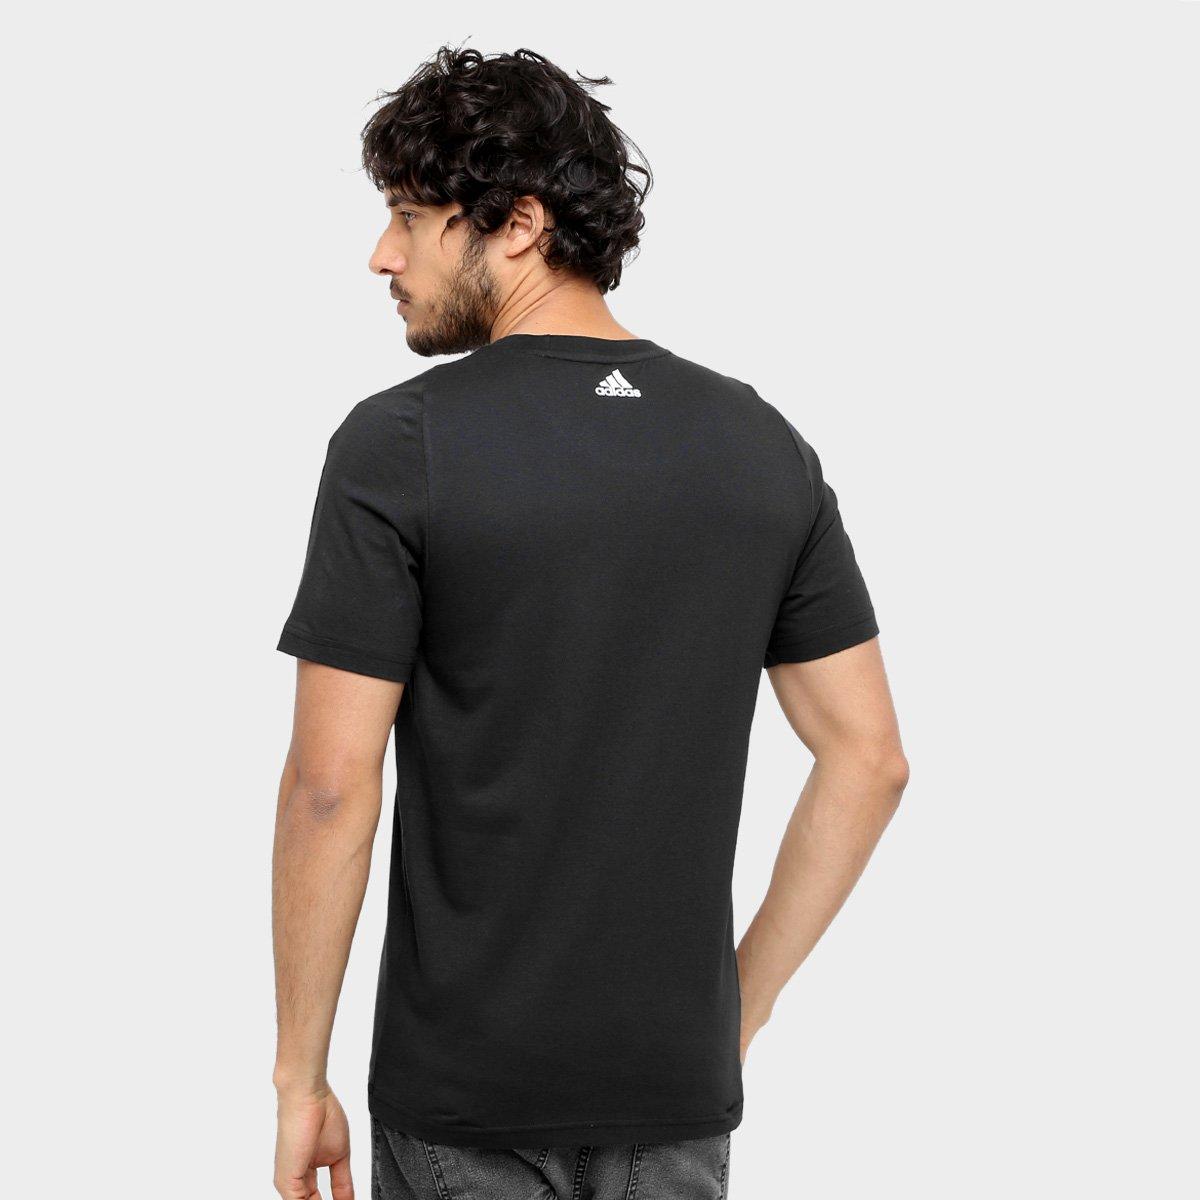 Camiseta Adidas Ess Linear Tee - Compre Agora  d5acf7b359a9b